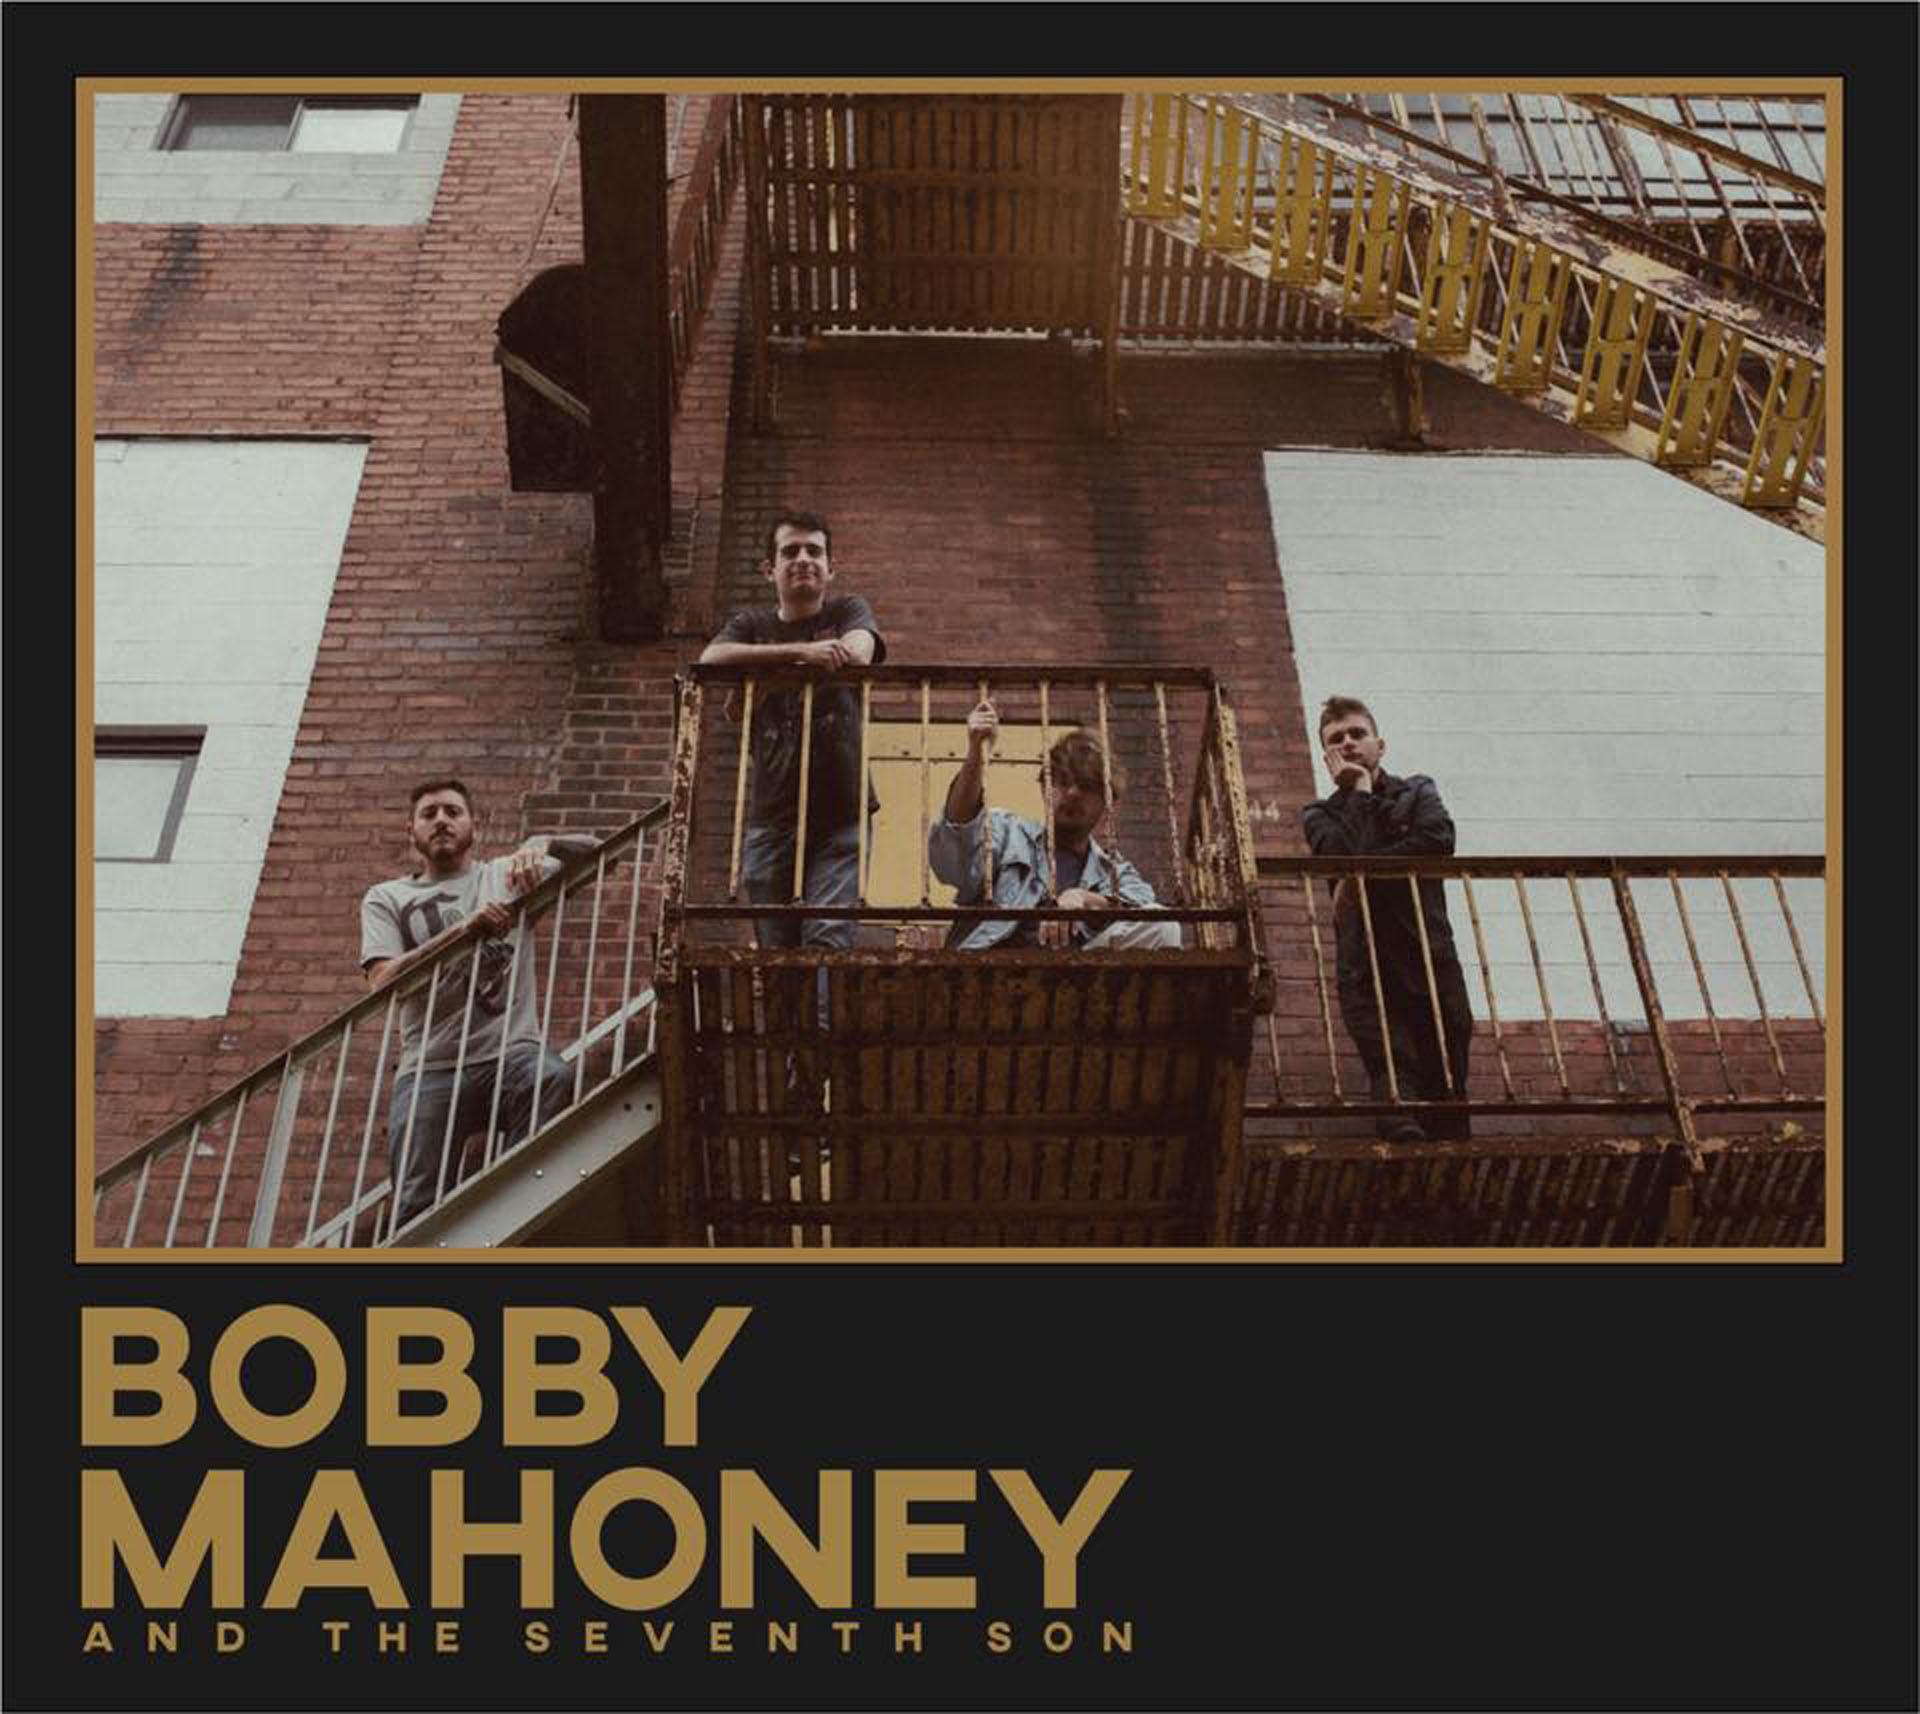 Bobby Mahoney and the Seventh Son album cover.jpg